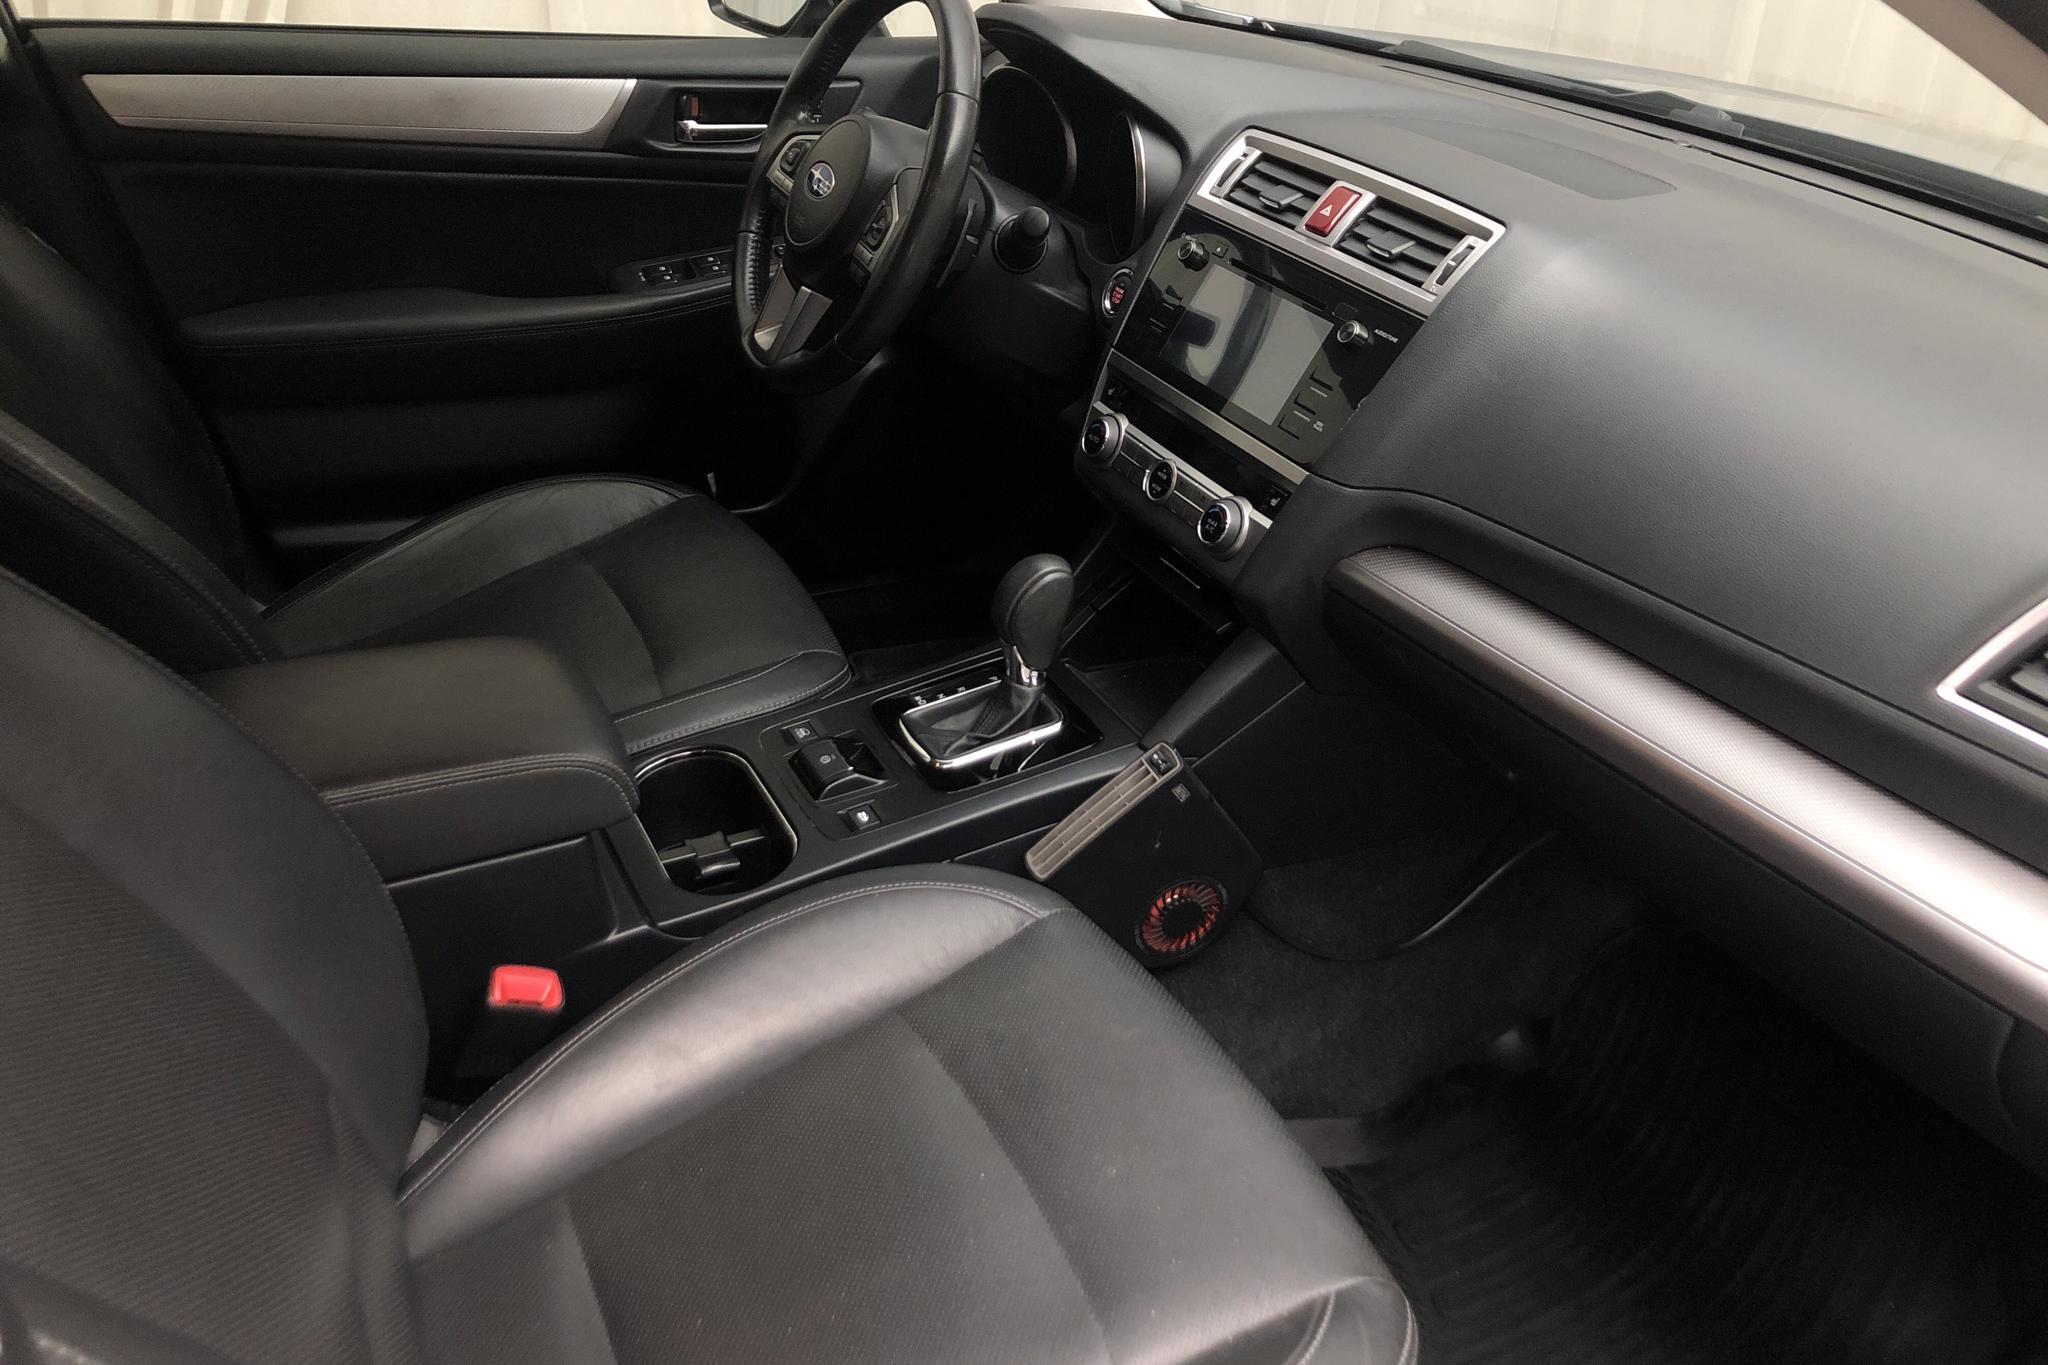 Subaru Outback 2.5i 4WD (173hk) - 11 525 mil - Automat - grå - 2016